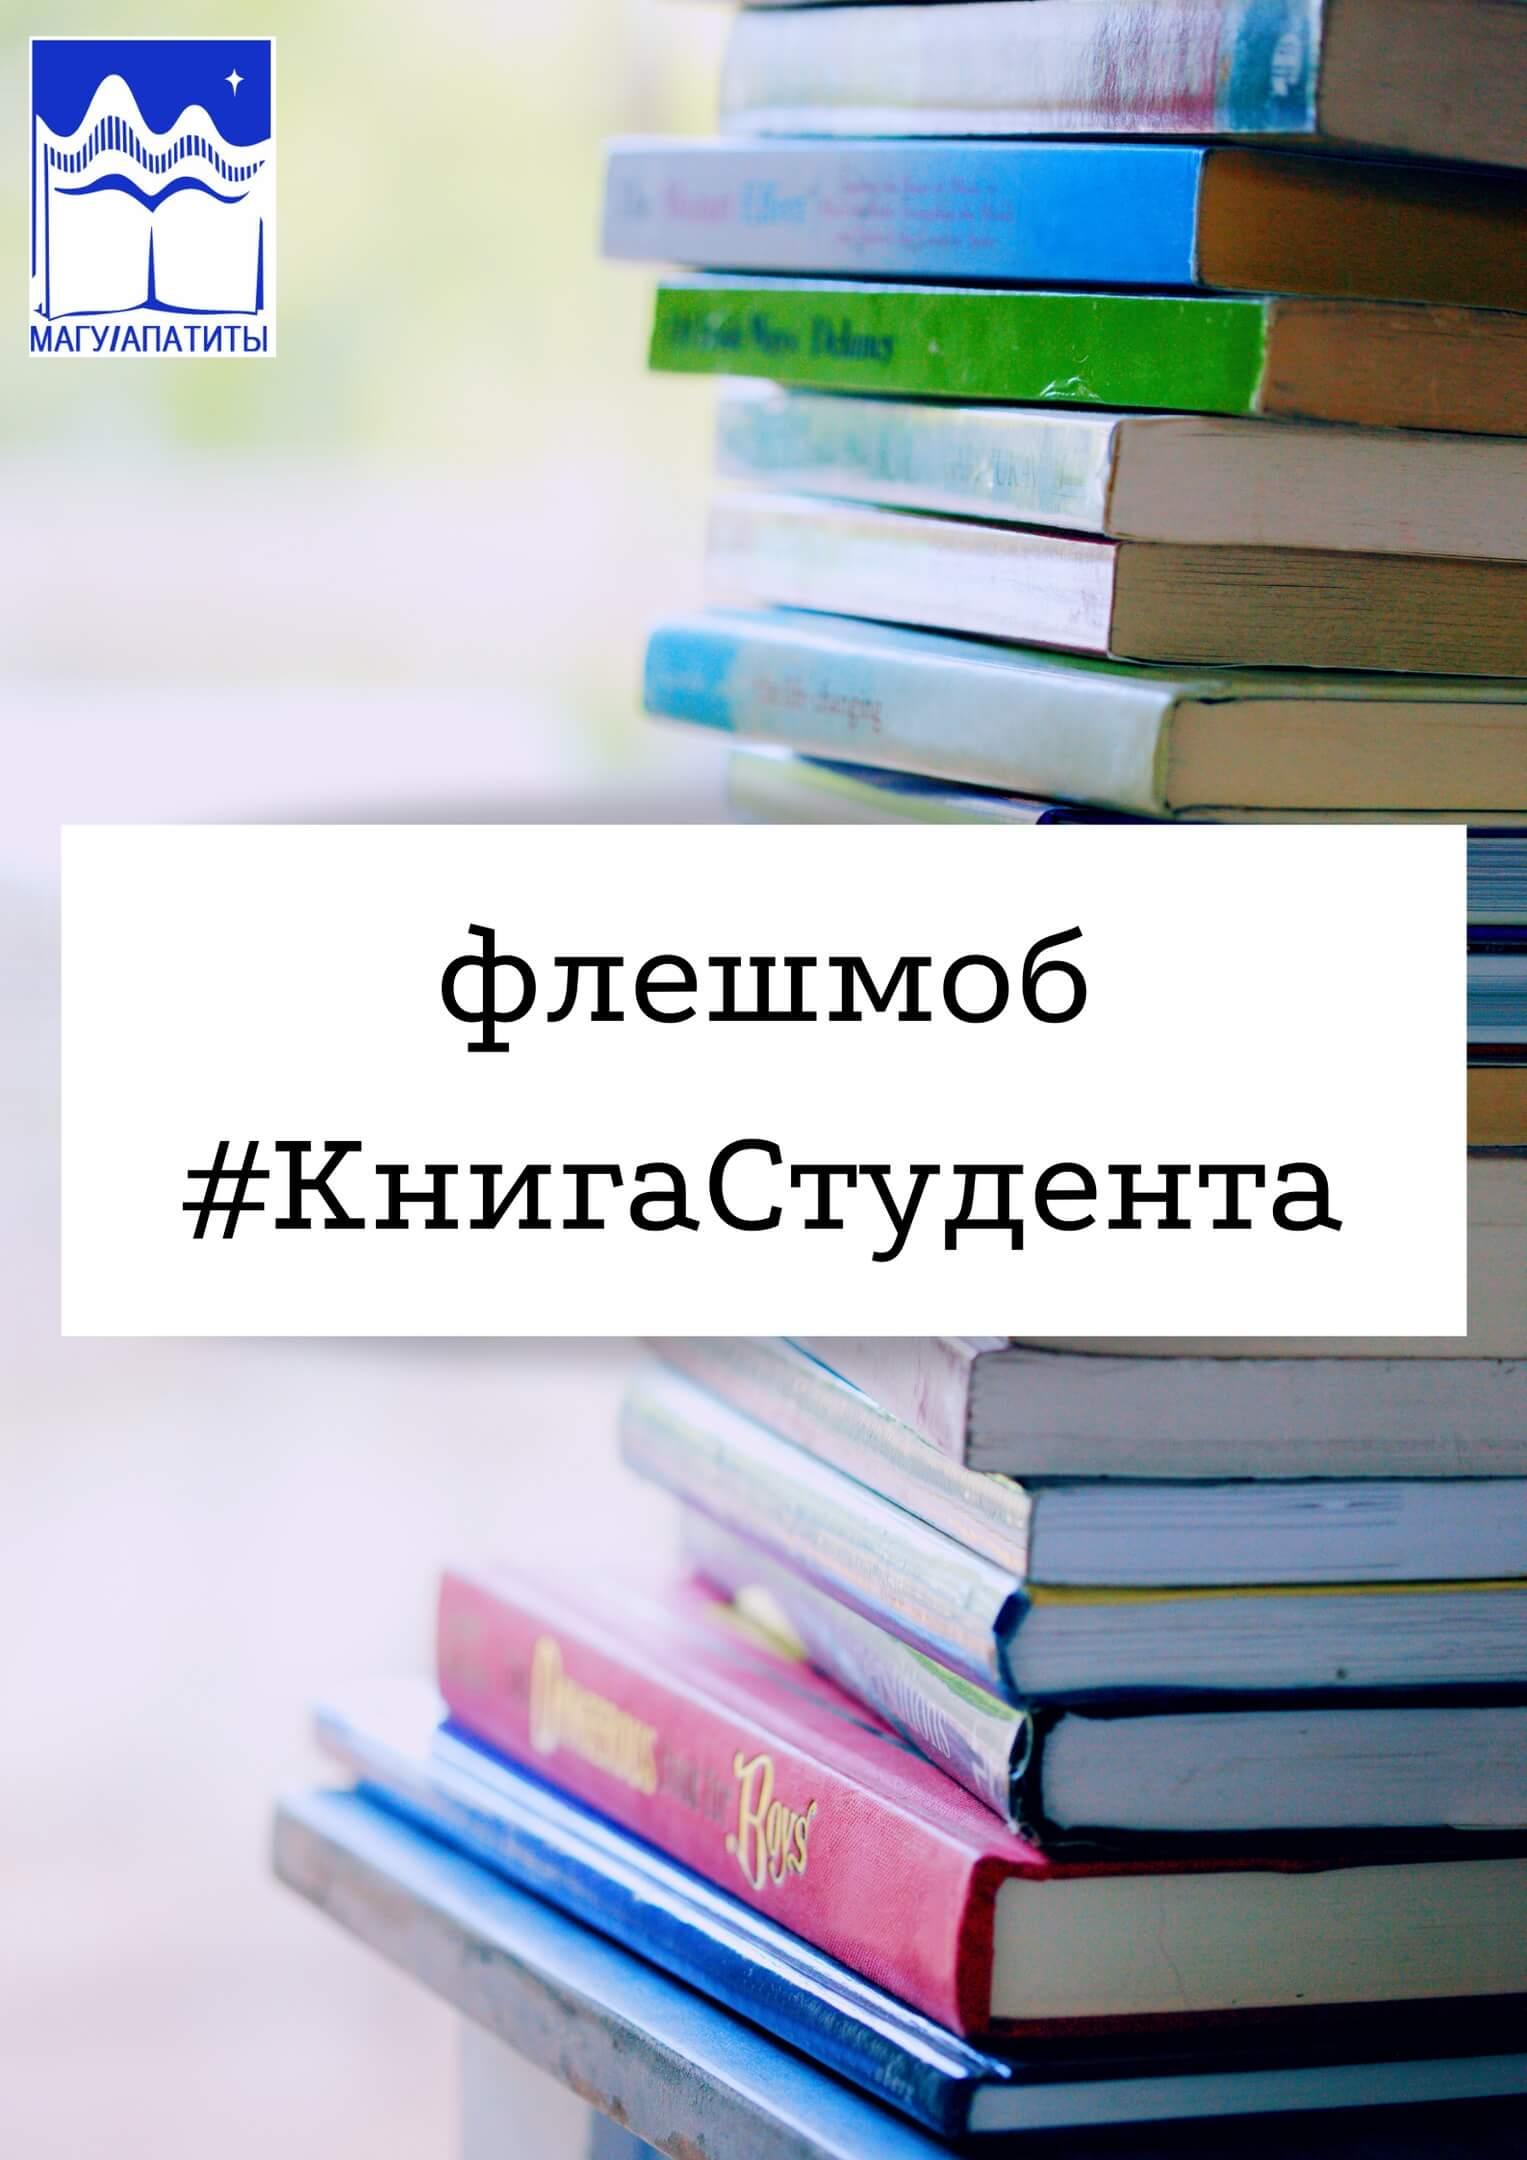 📚 ФЛЕШМОБ #КНИГАСТУДЕНТА 👩🎓